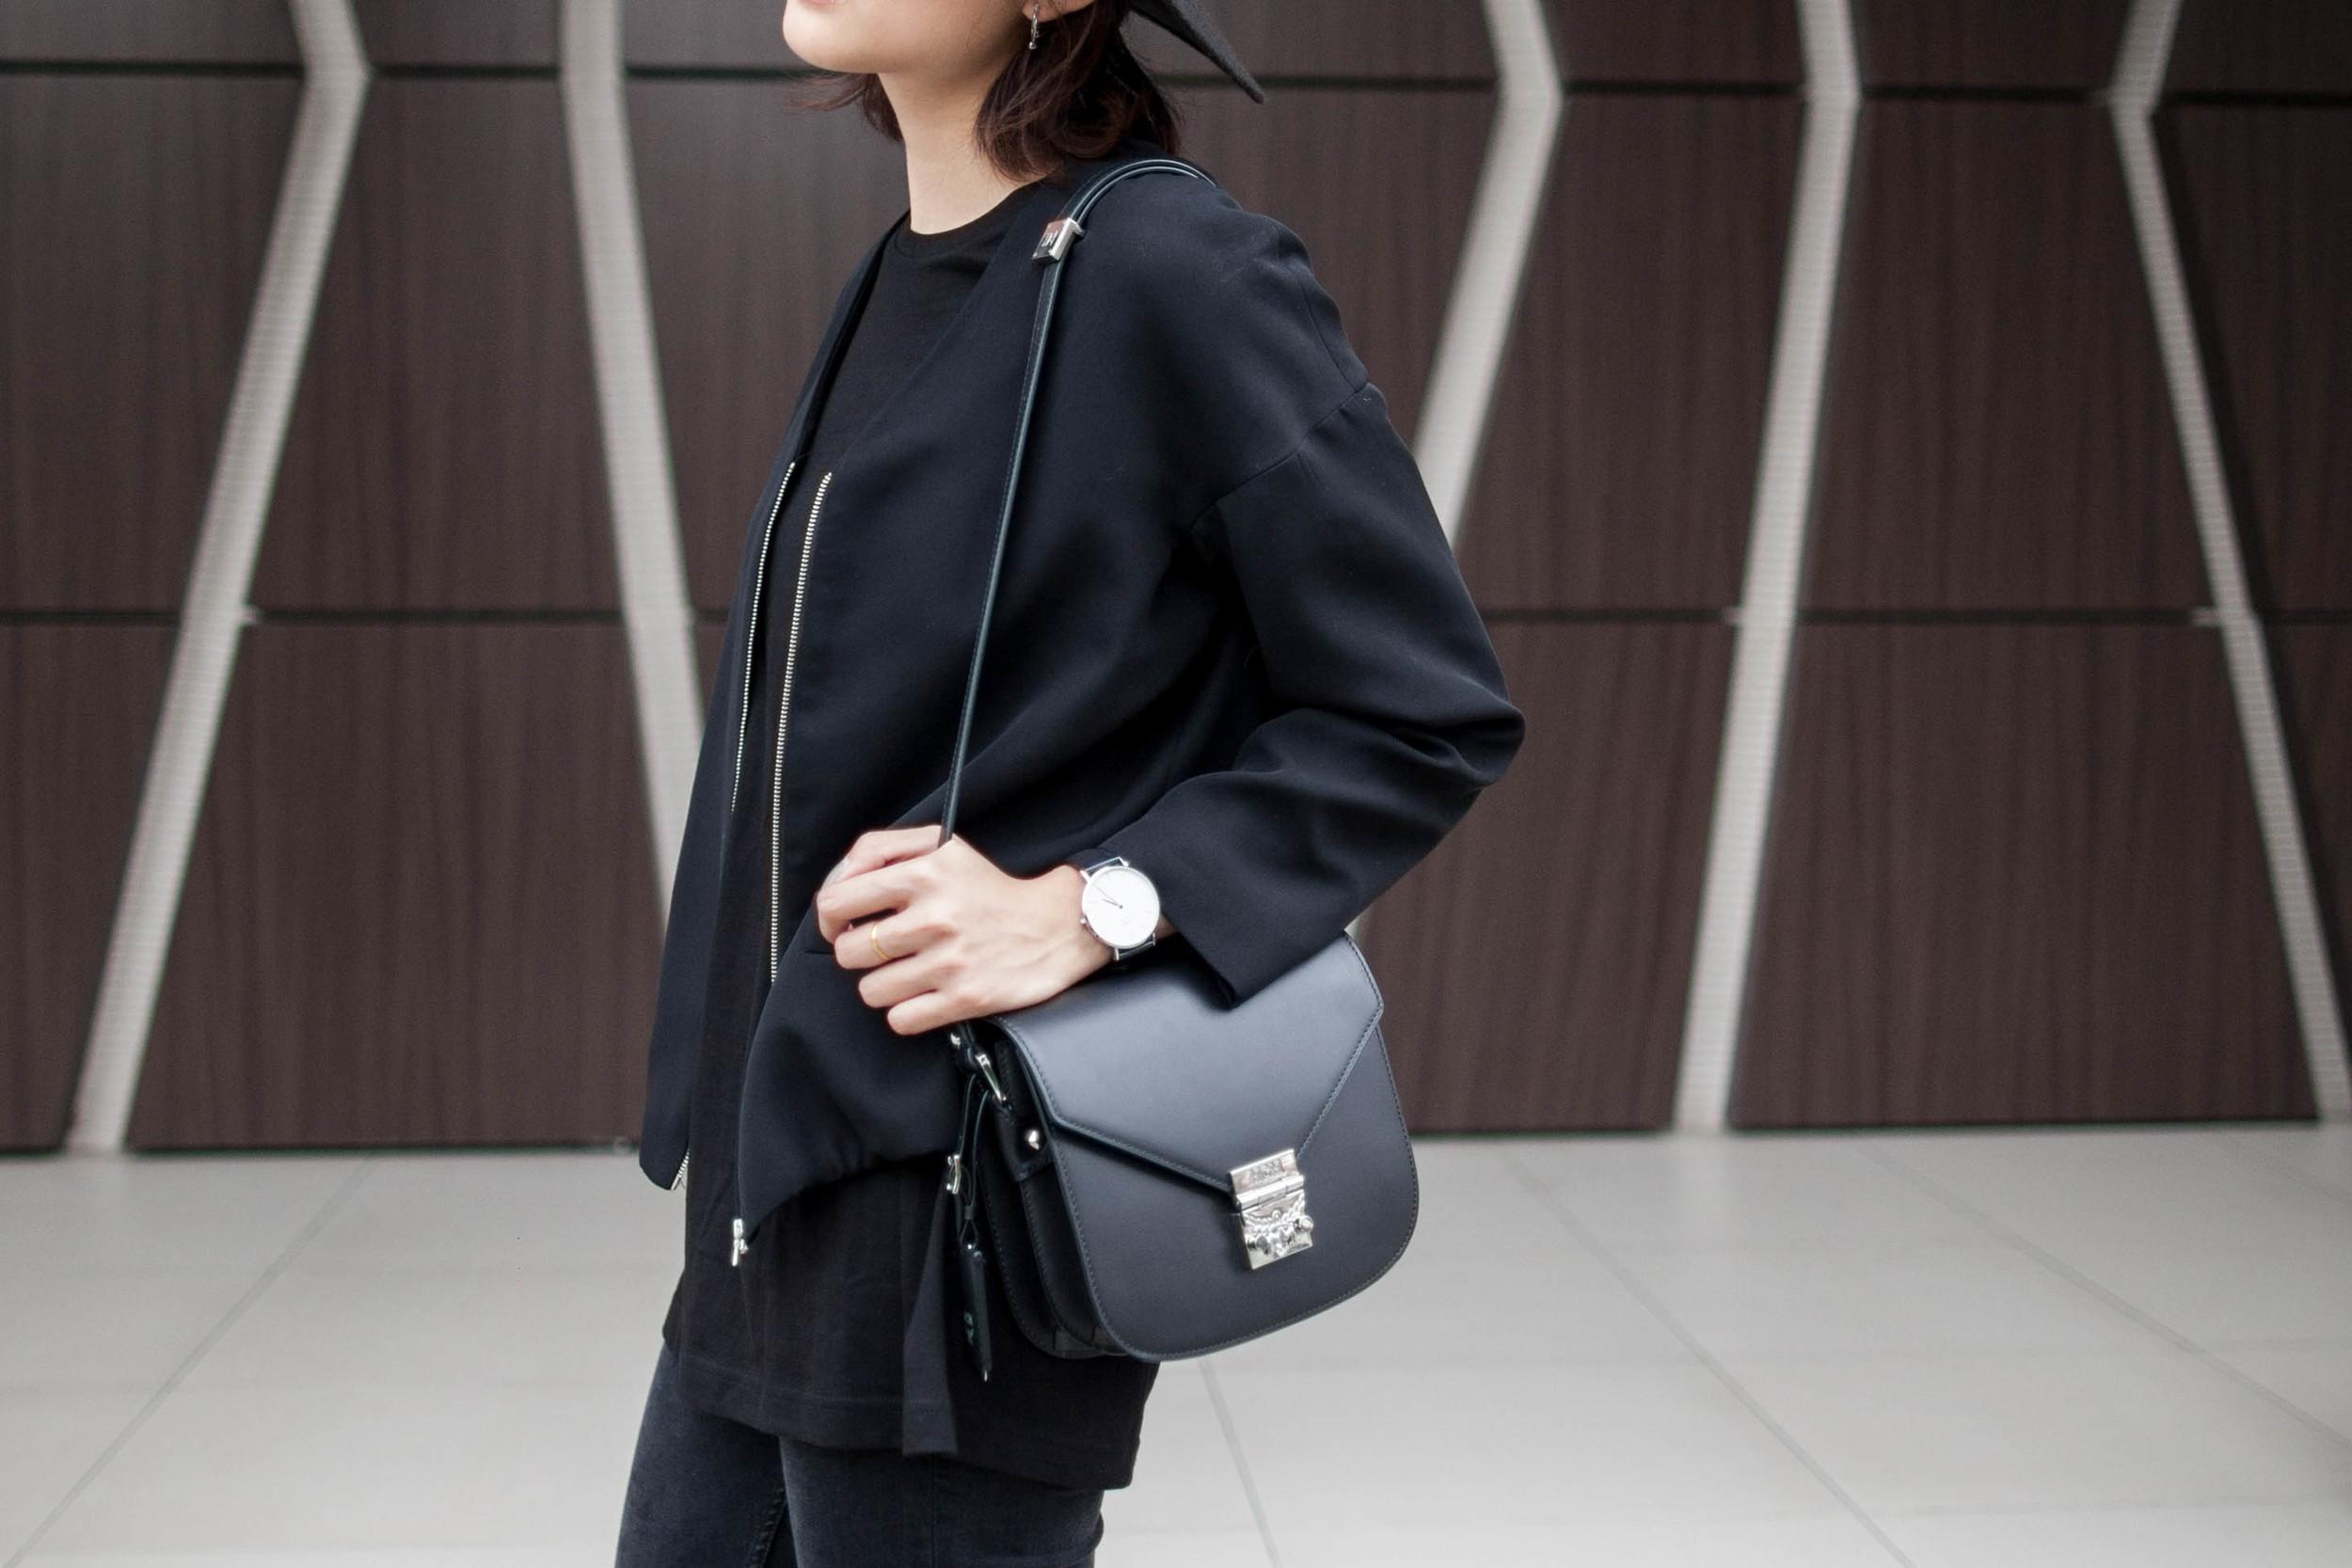 vietnamese fashion blogger julia doan mcm patricia bag adidas tubular defiant-5.jpg